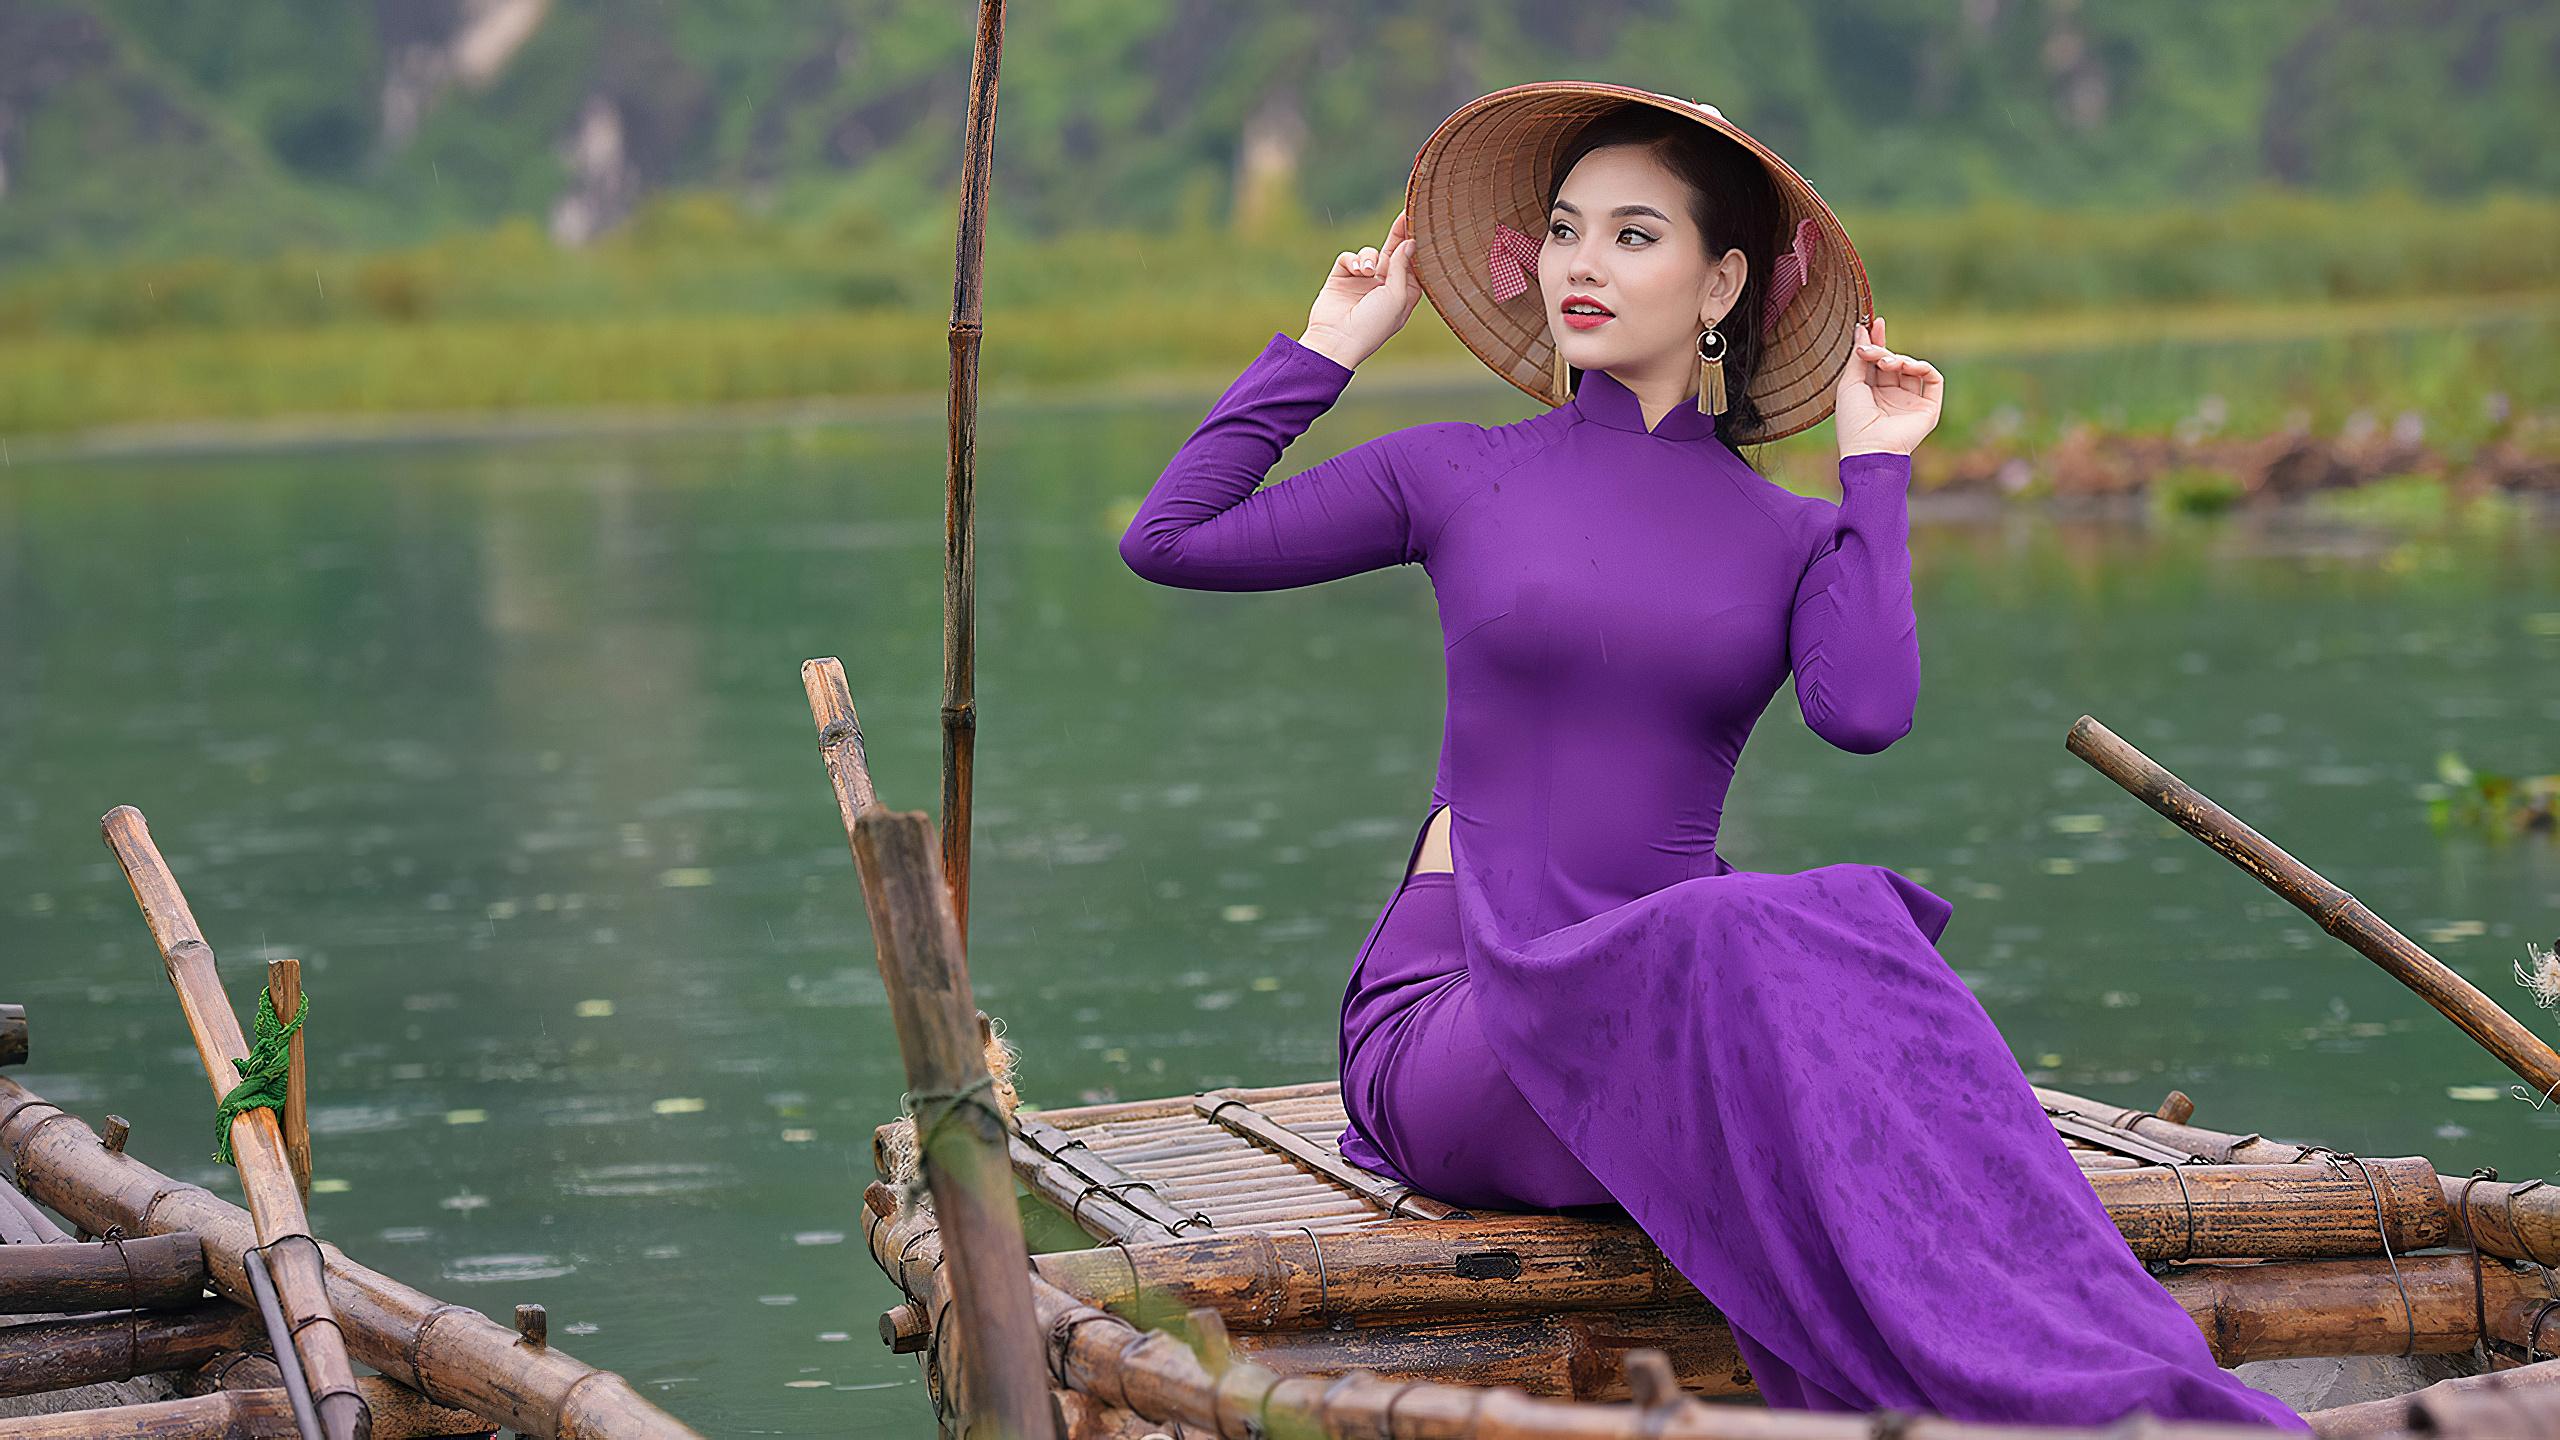 Wallpaper Vietnamese Costumes Asian People Water Sitting